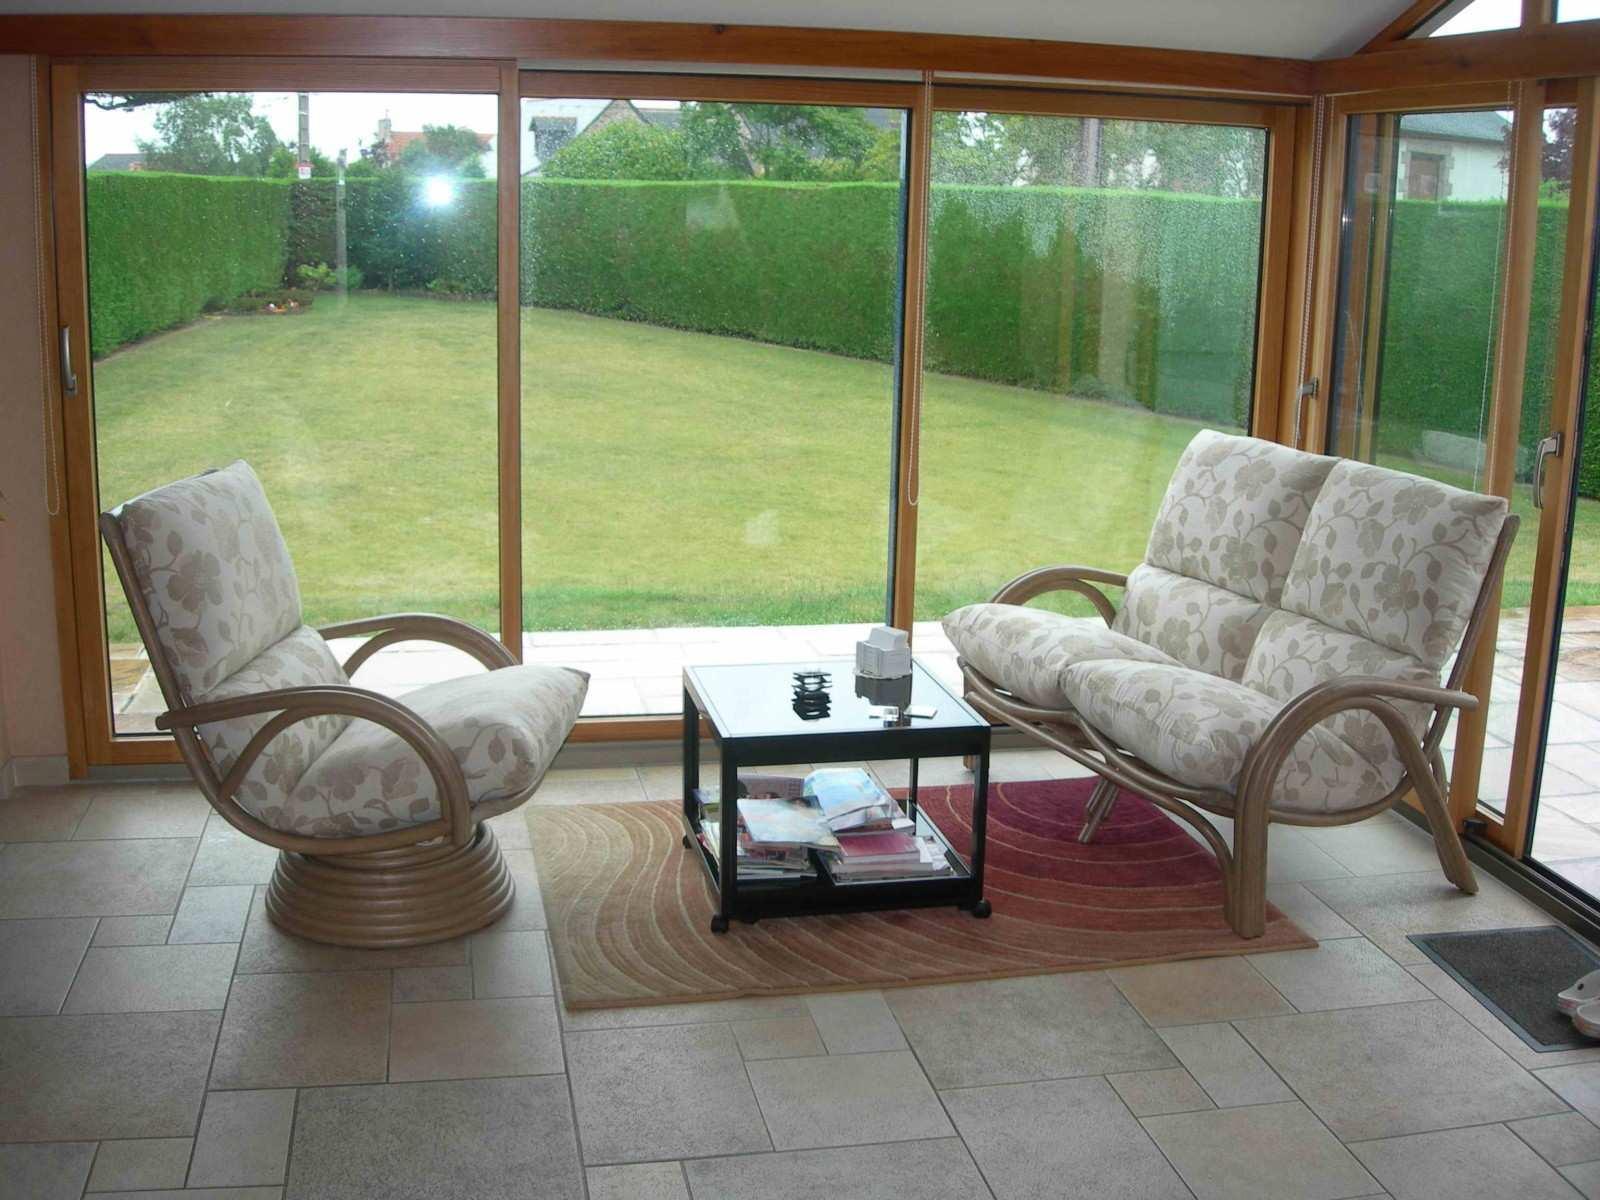 Salon rotin pour veranda pas cher - veranda-styledevie.fr